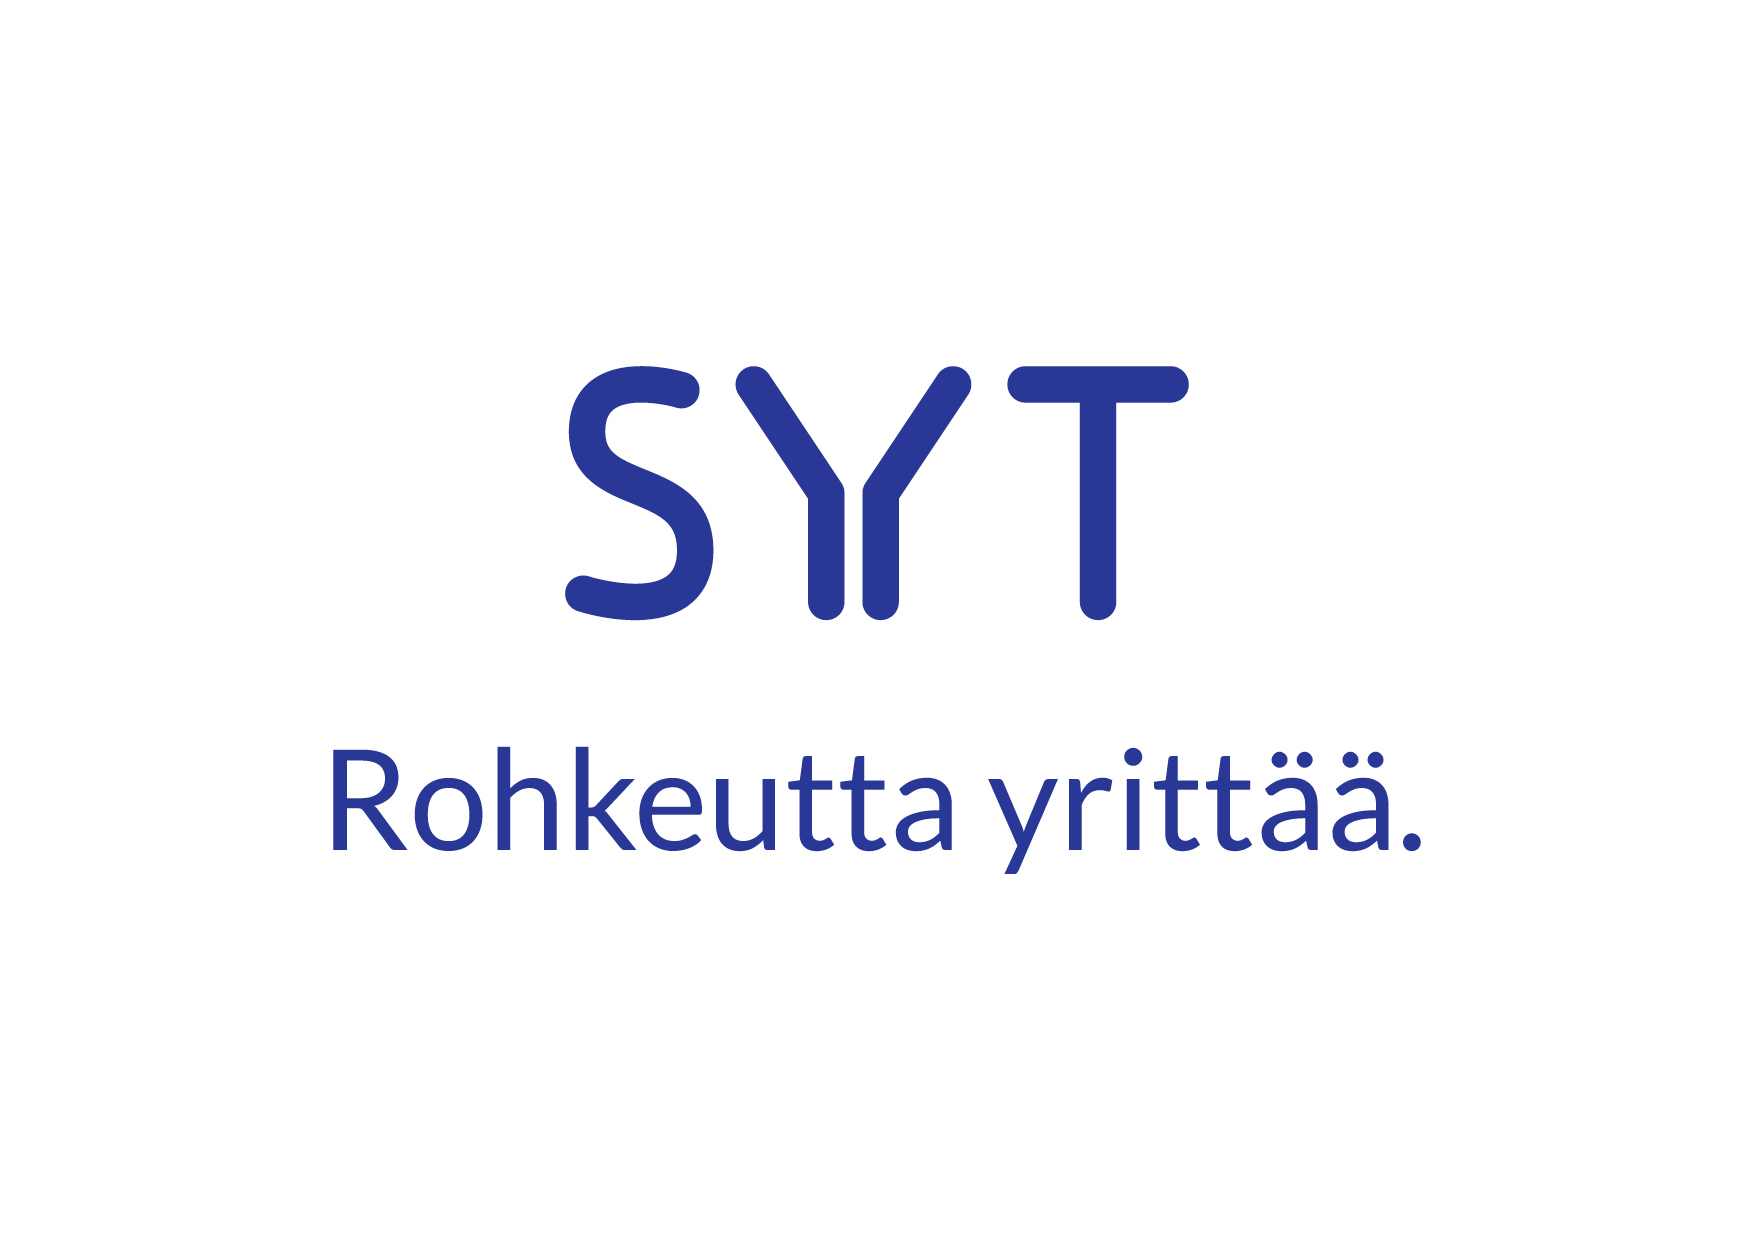 syt_logo_11